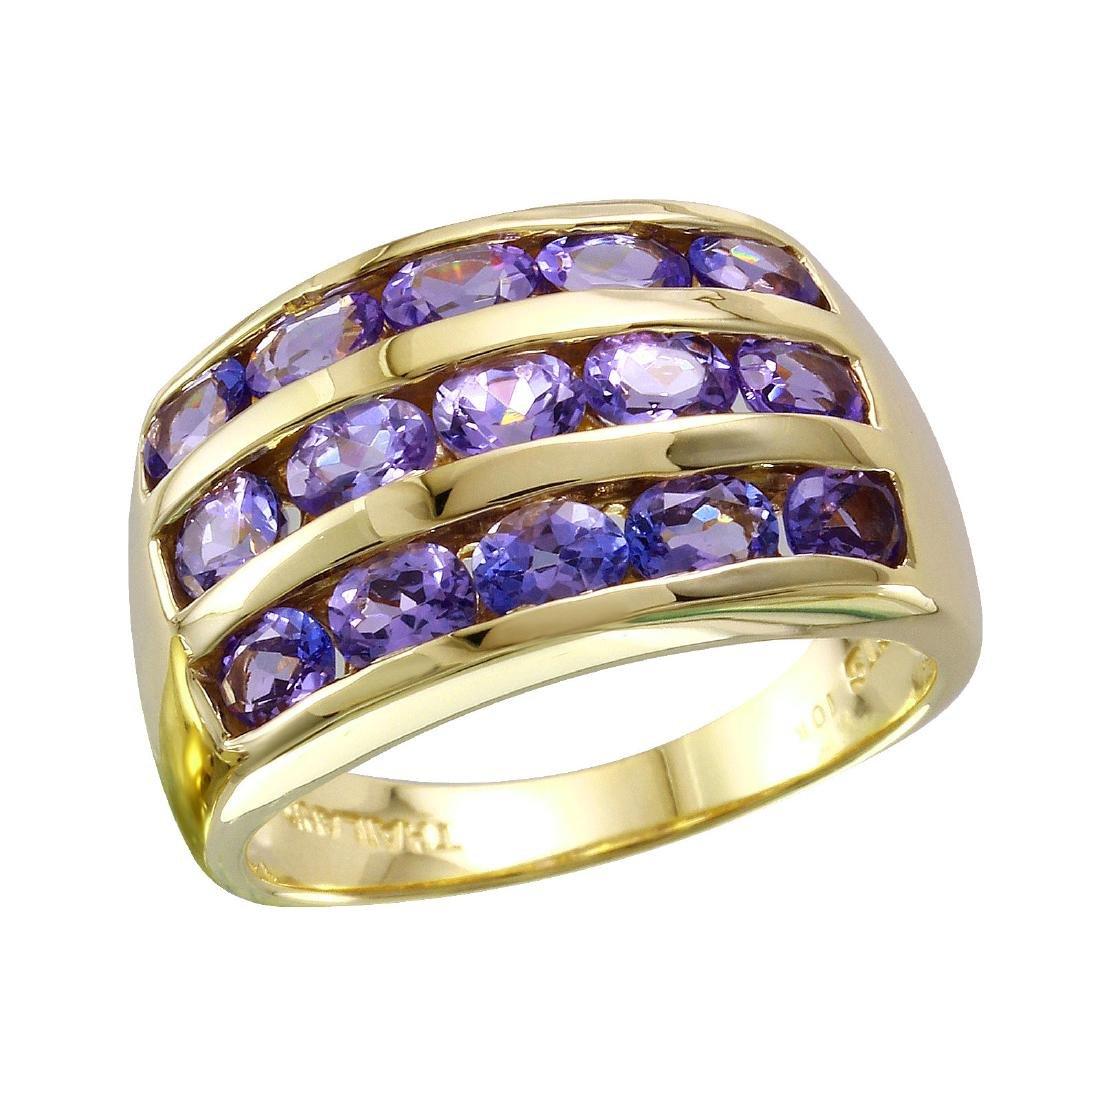 10KT Yellow Gold Tanzanite Ring